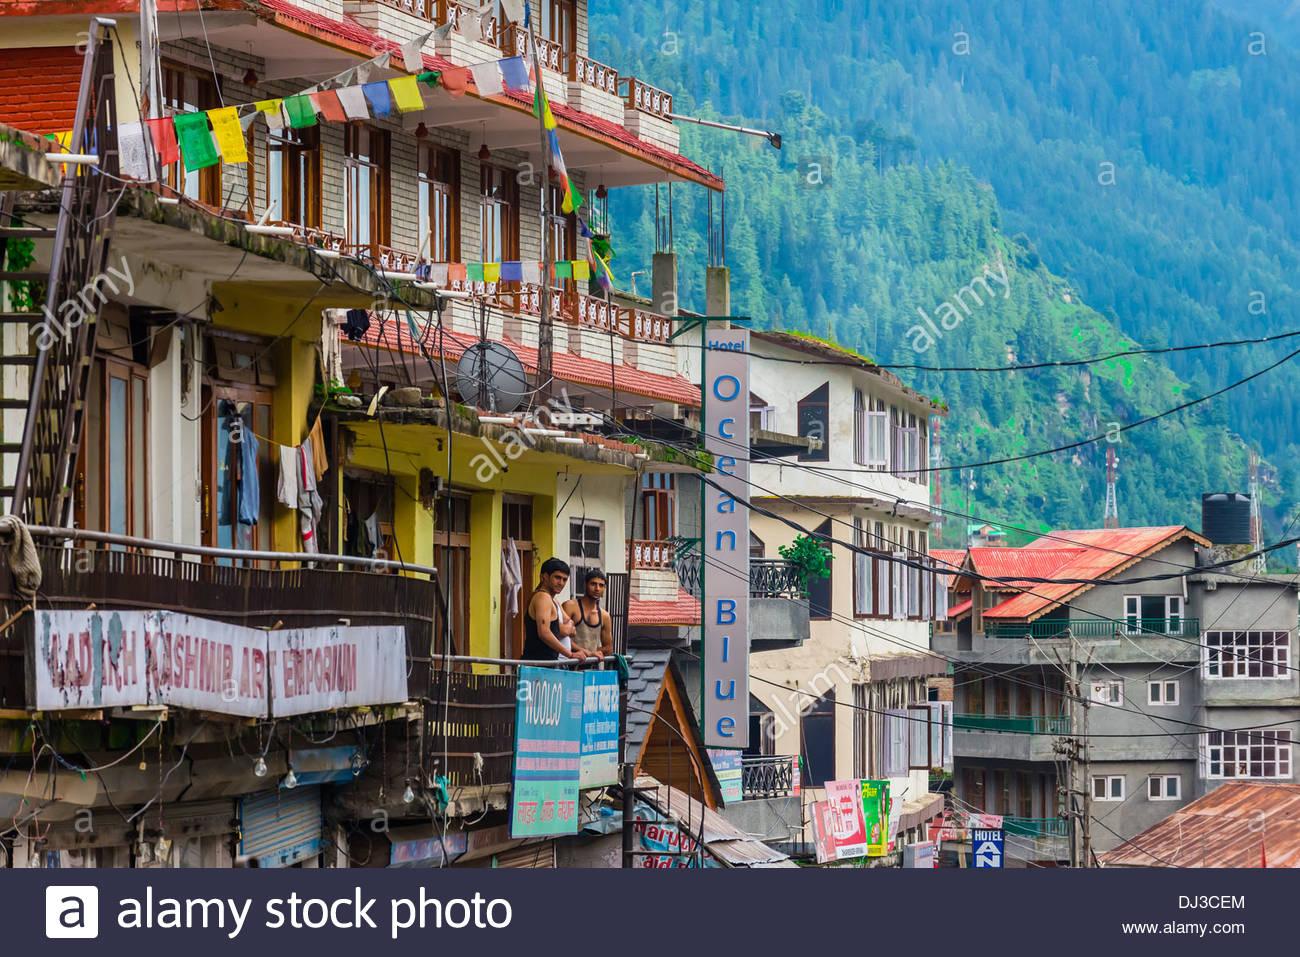 Manali, Himachal Pradesh, India. - Stock Image